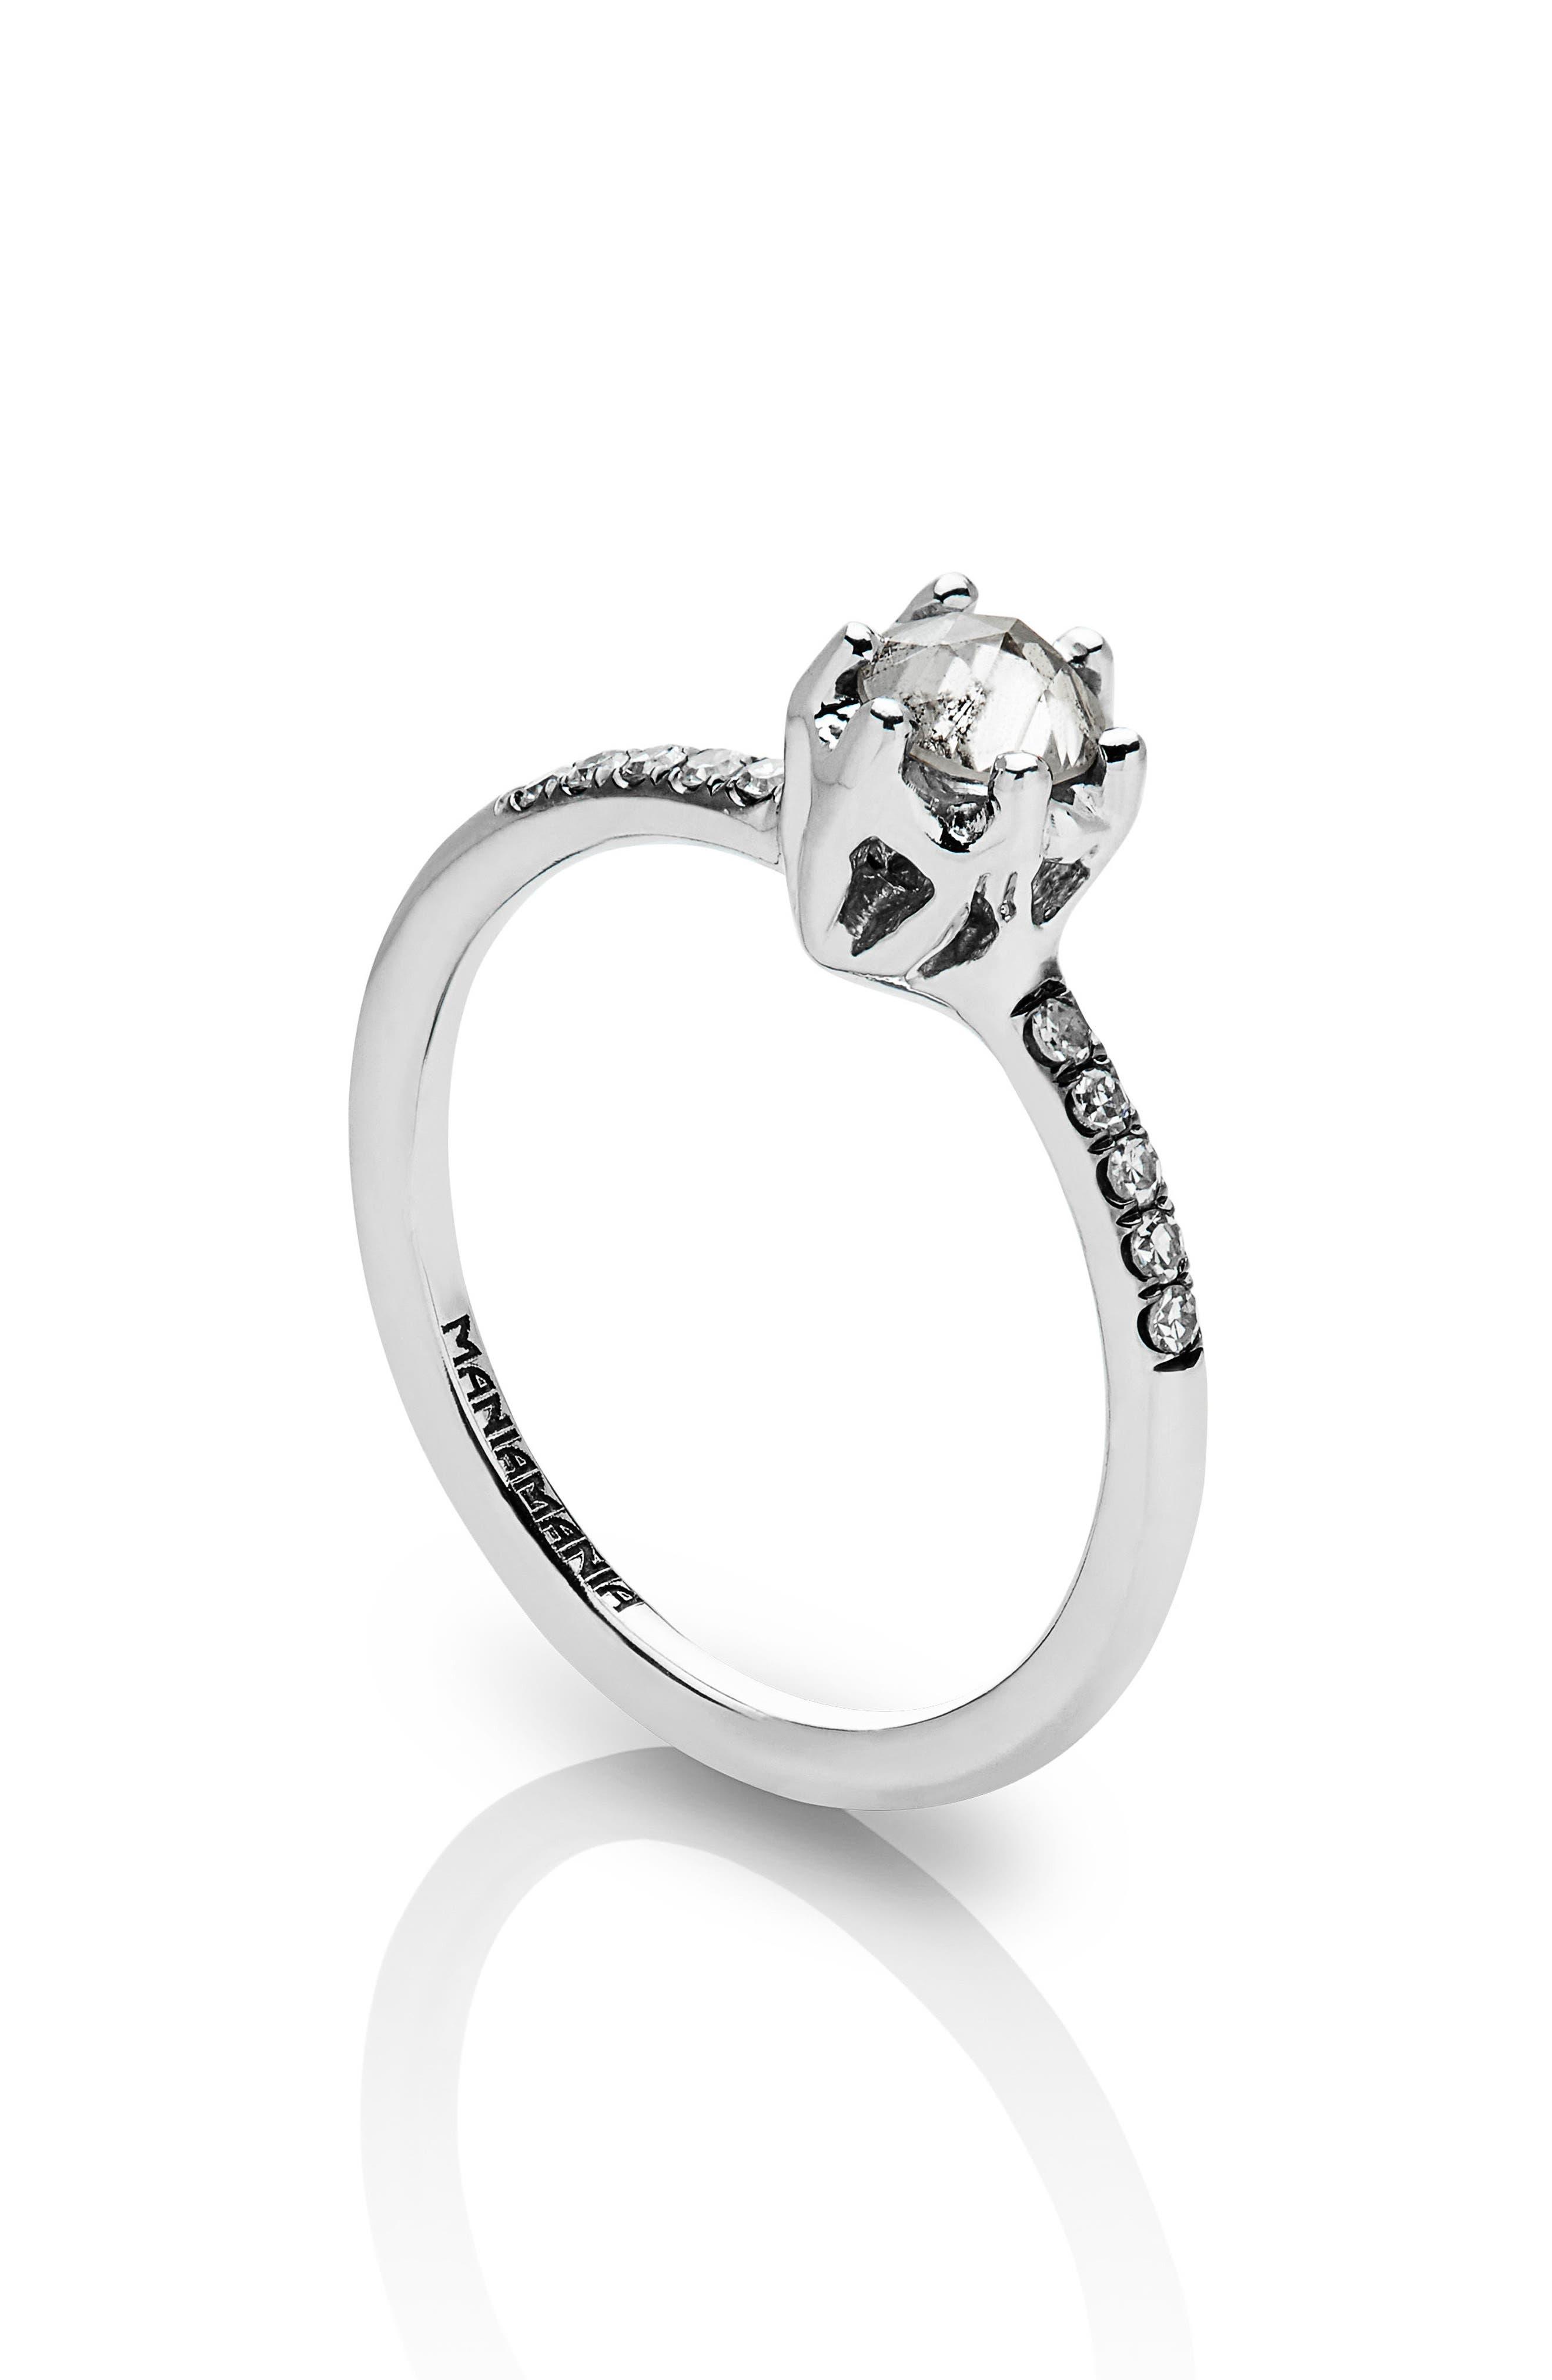 Entity Diamond Solitaire Ring,                             Alternate thumbnail 4, color,                             White Gold